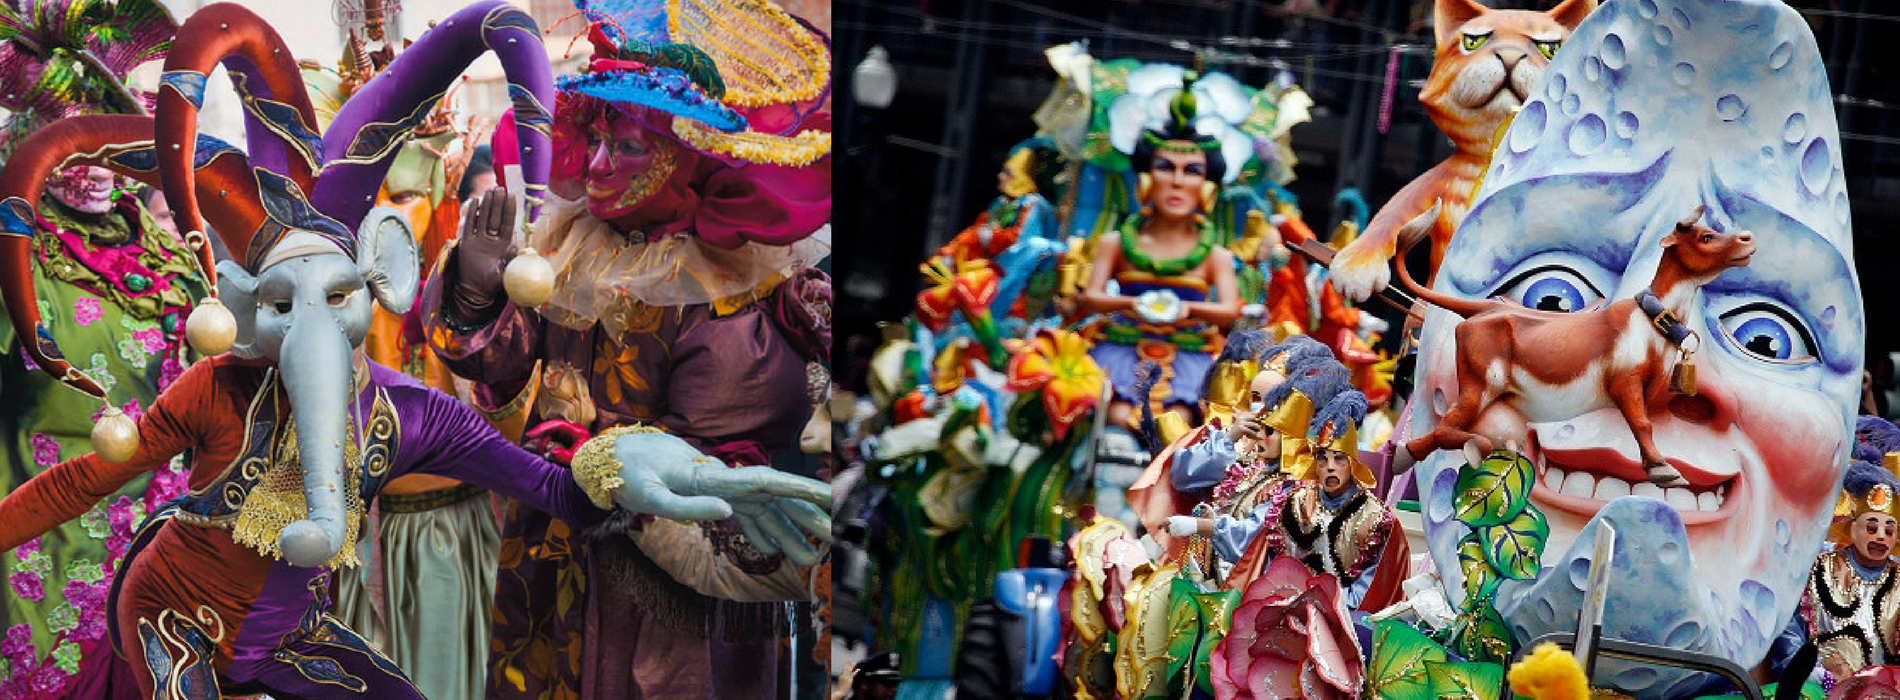 Carnevale 2018 a Caserta: sfilata dei carri in Reggia e in città